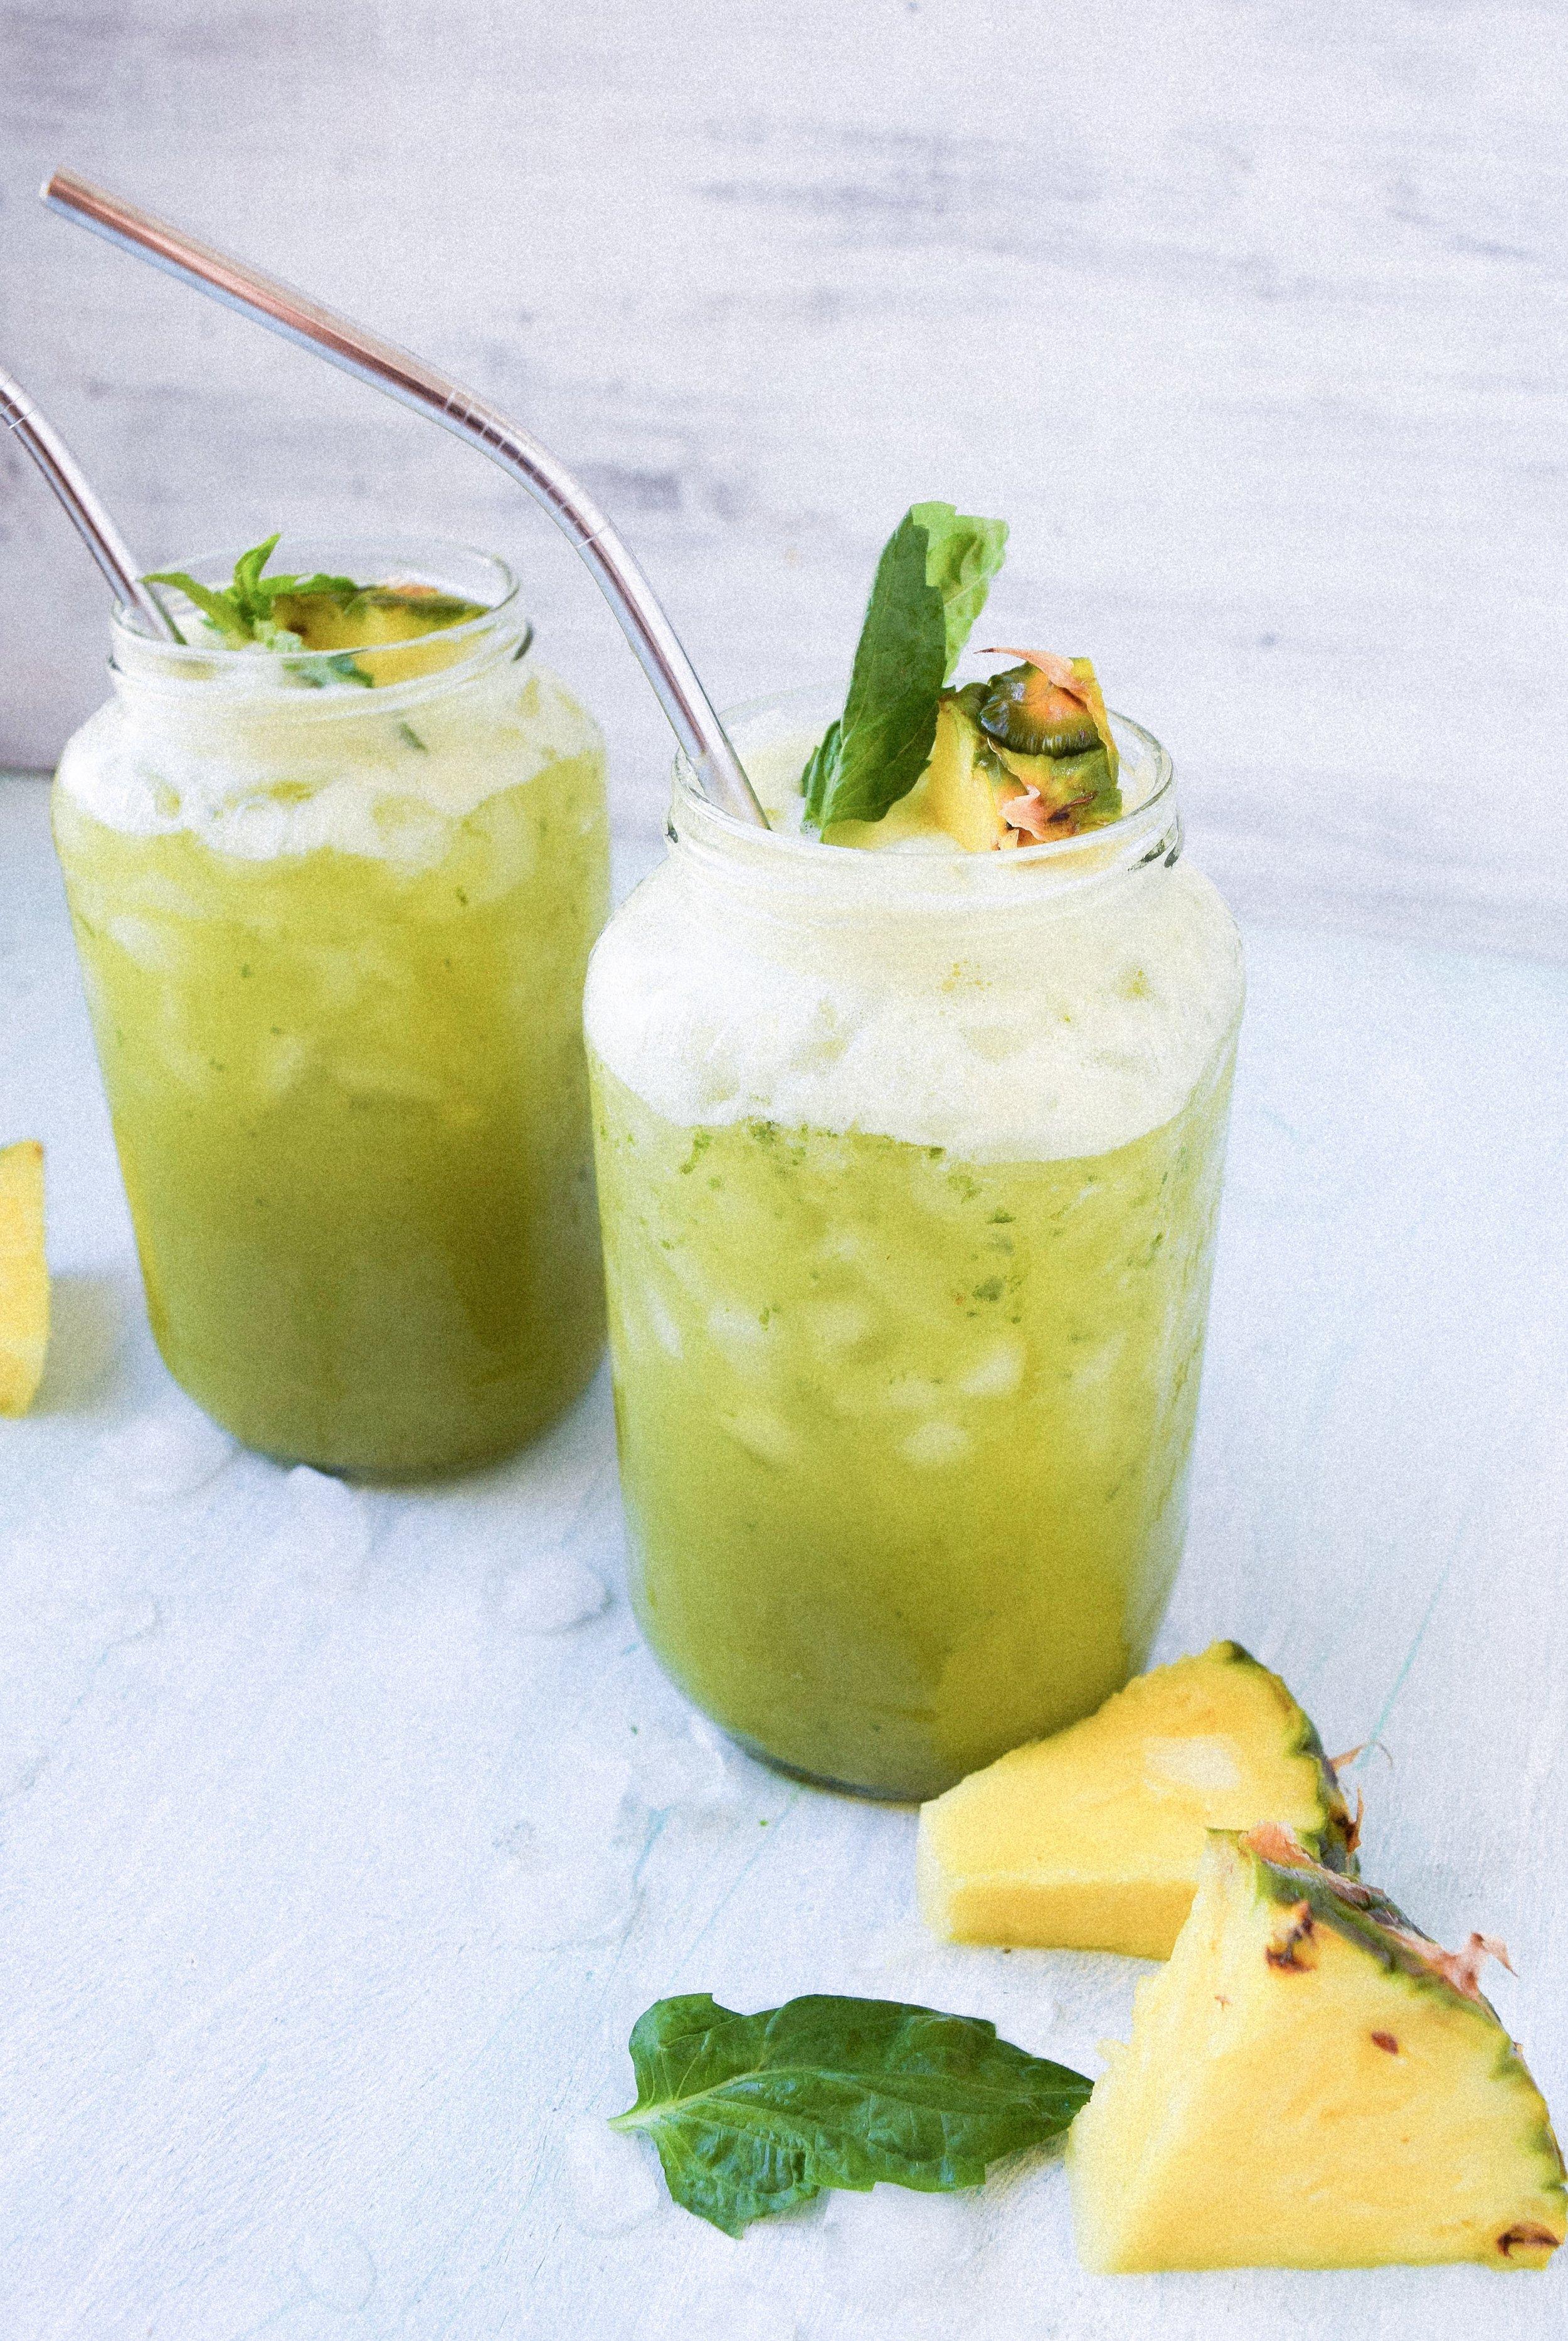 pineapple-basil-lemonade-juice.jpg